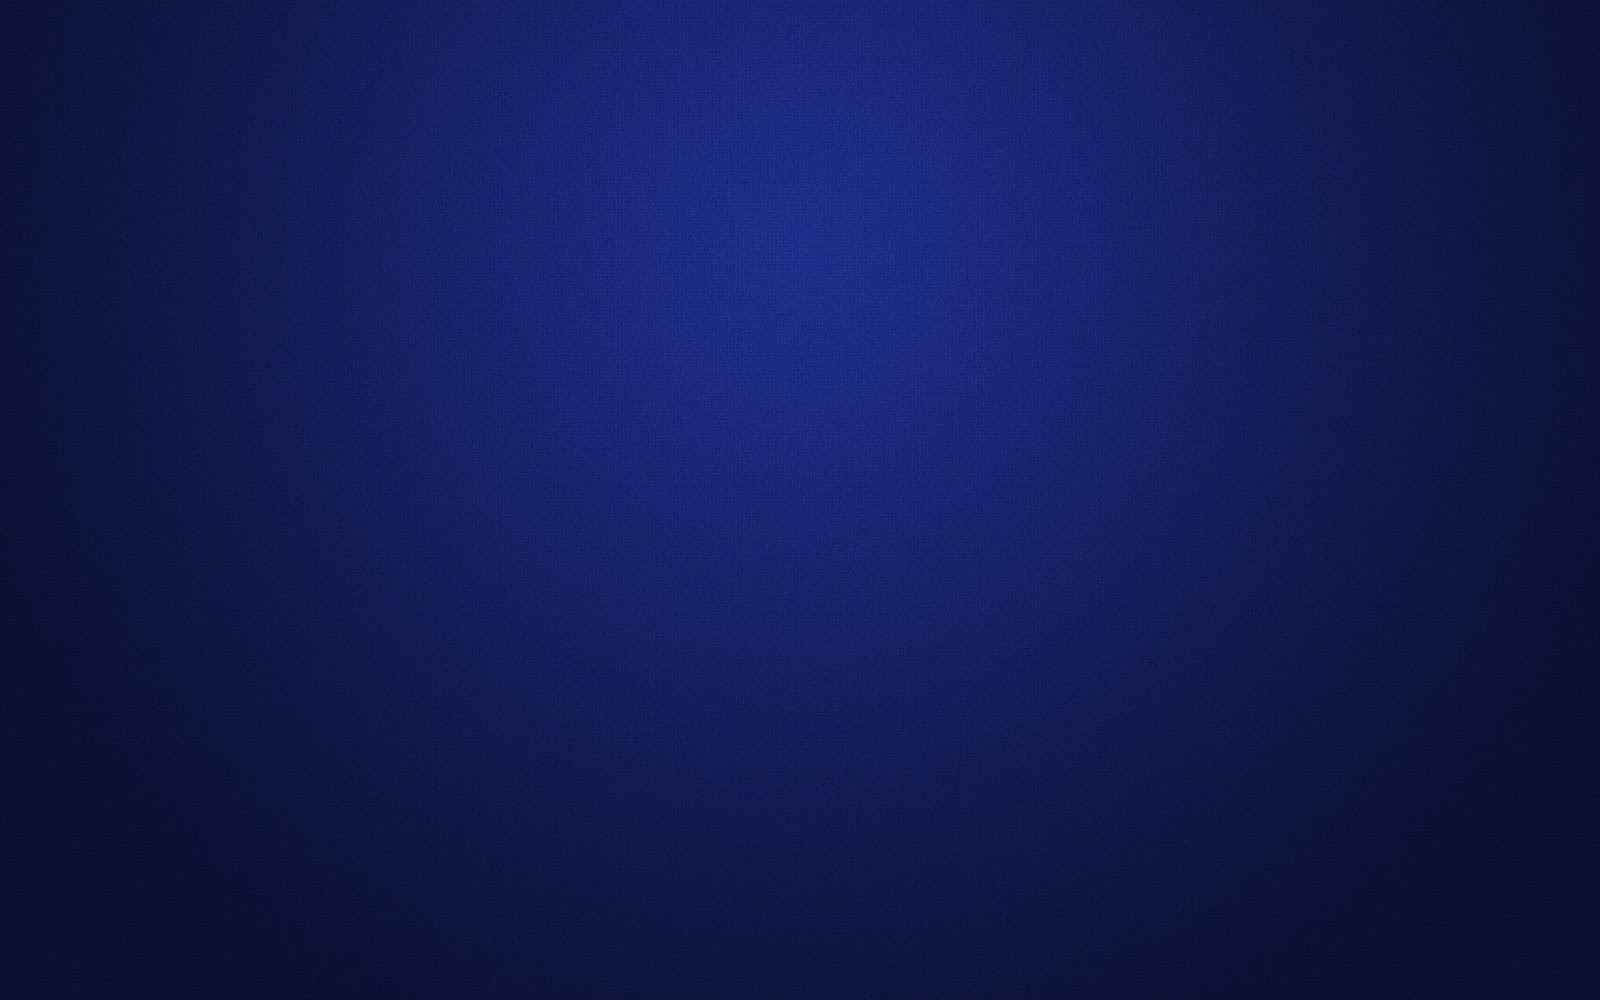 top desktop blue wallpapers blue wallpaper blue background hd 27jpg 1600x1000